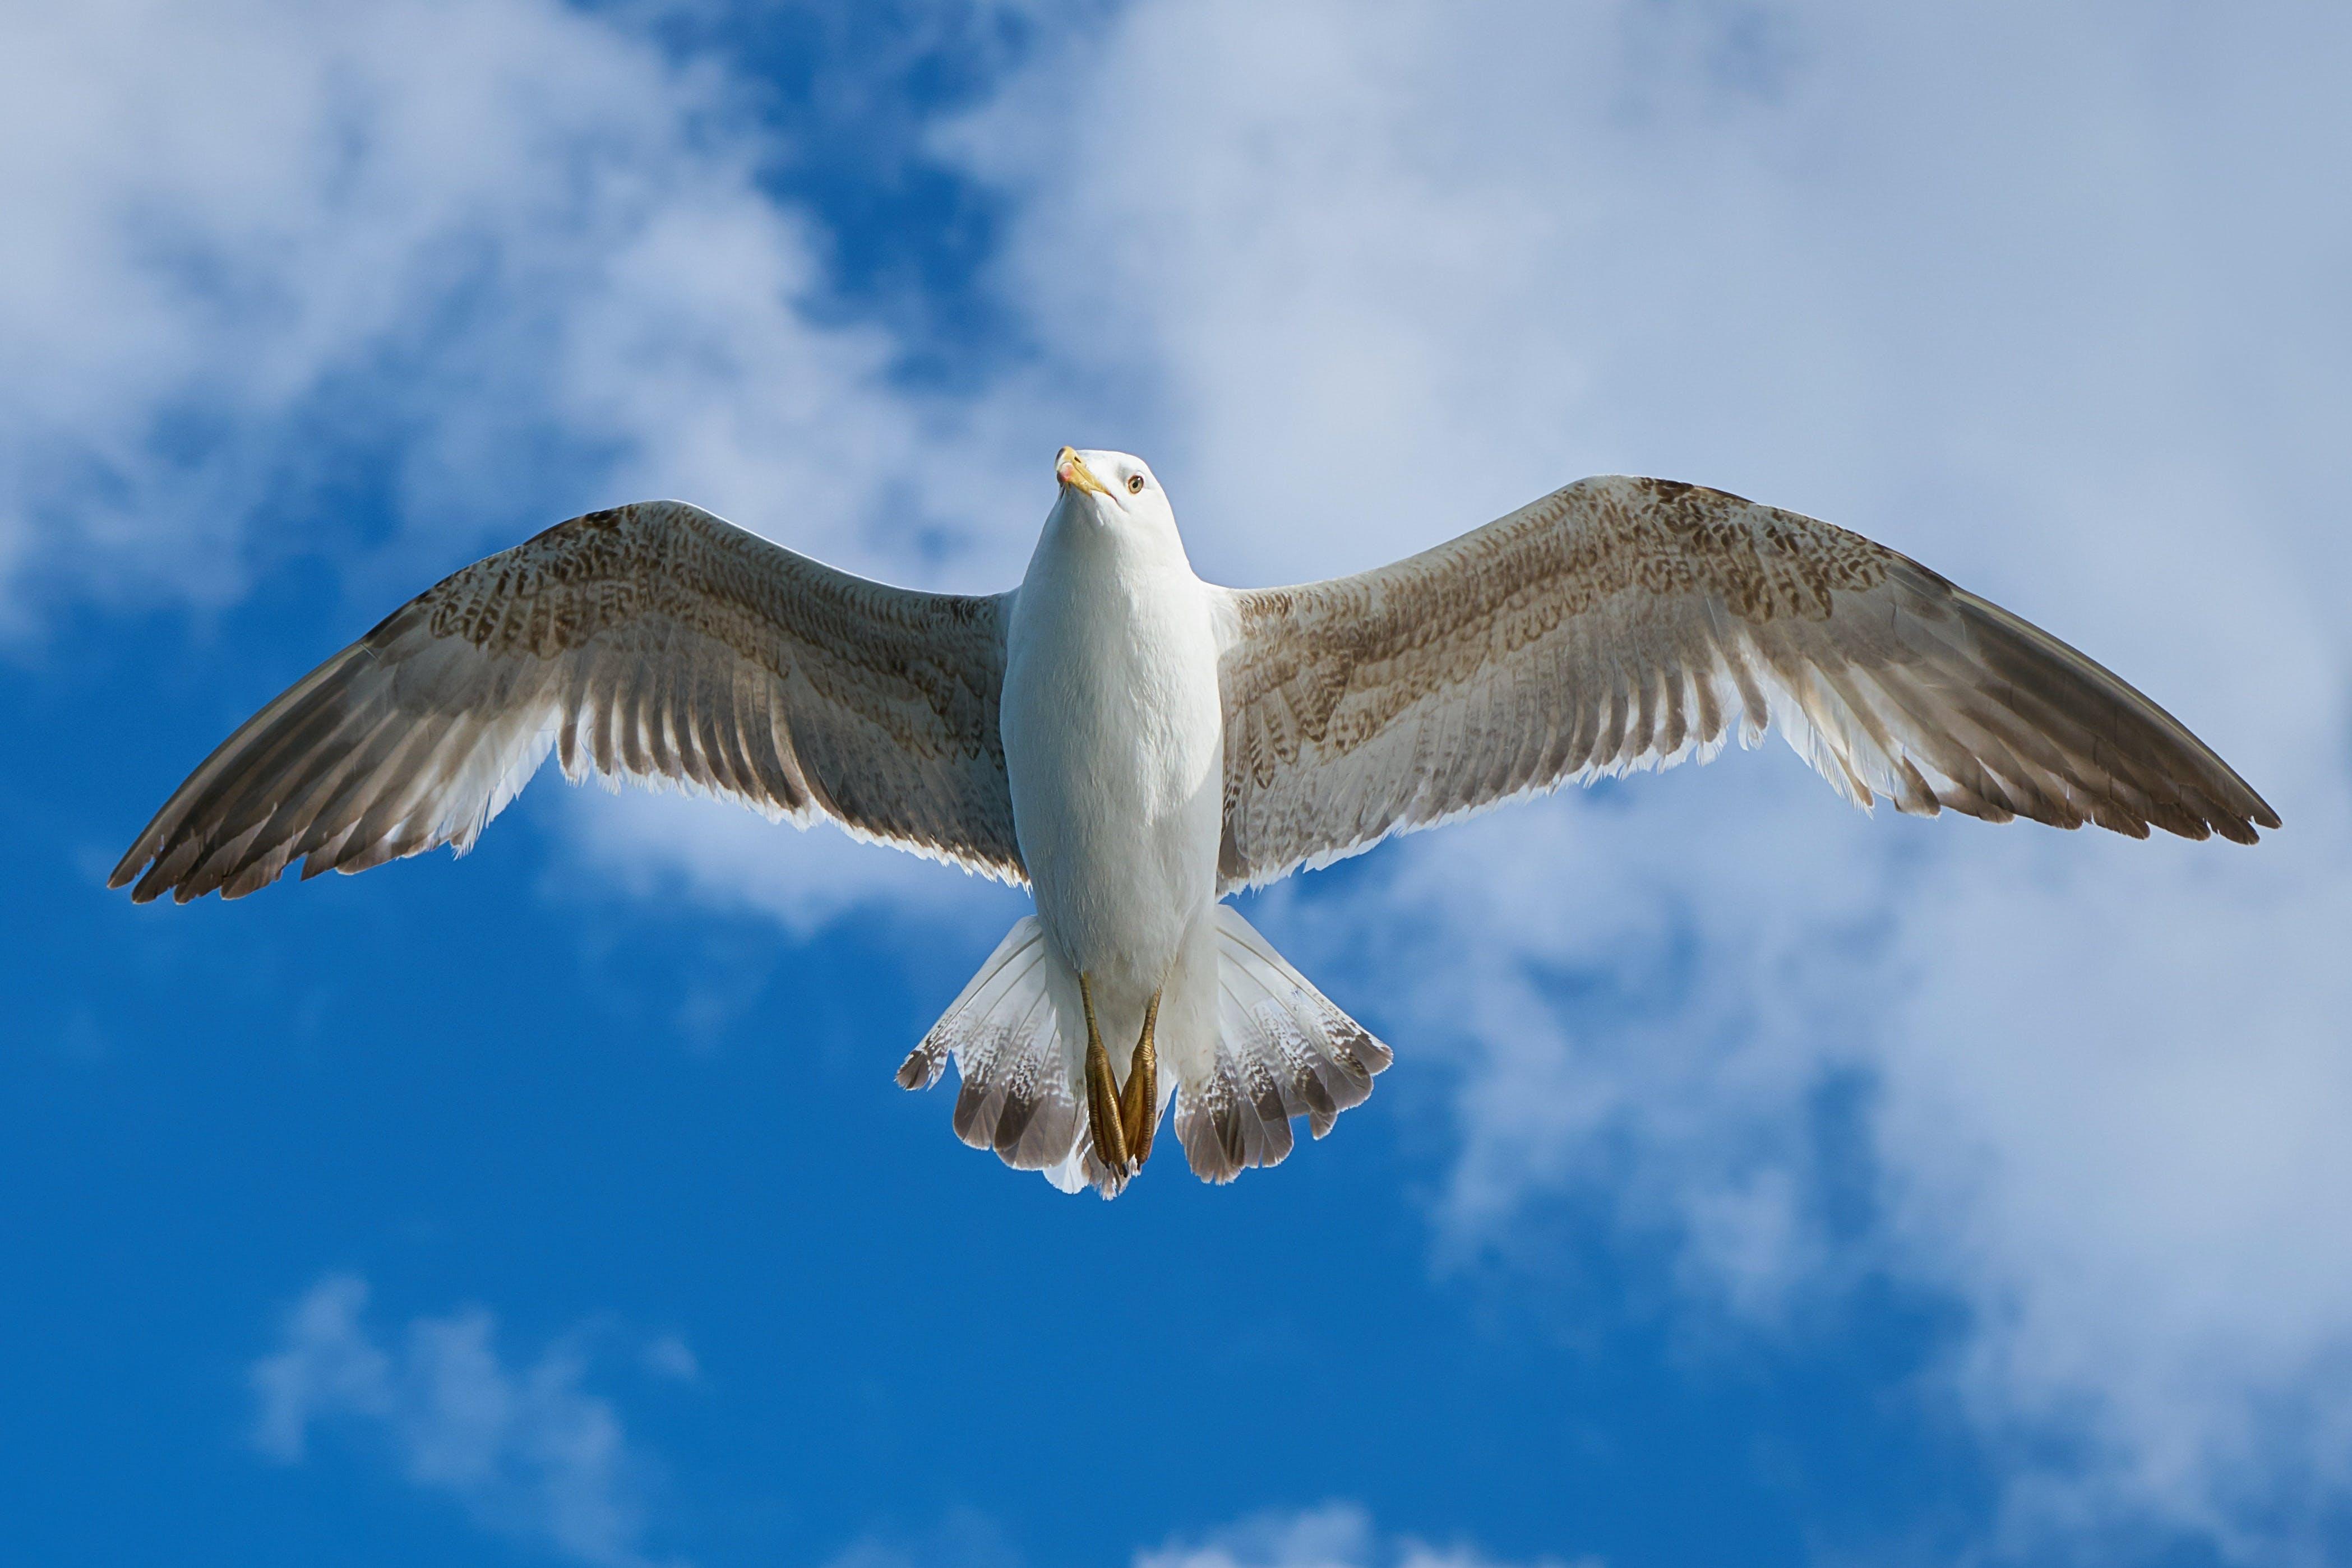 Fotos de stock gratuitas de alas, animal, cielo, fauna